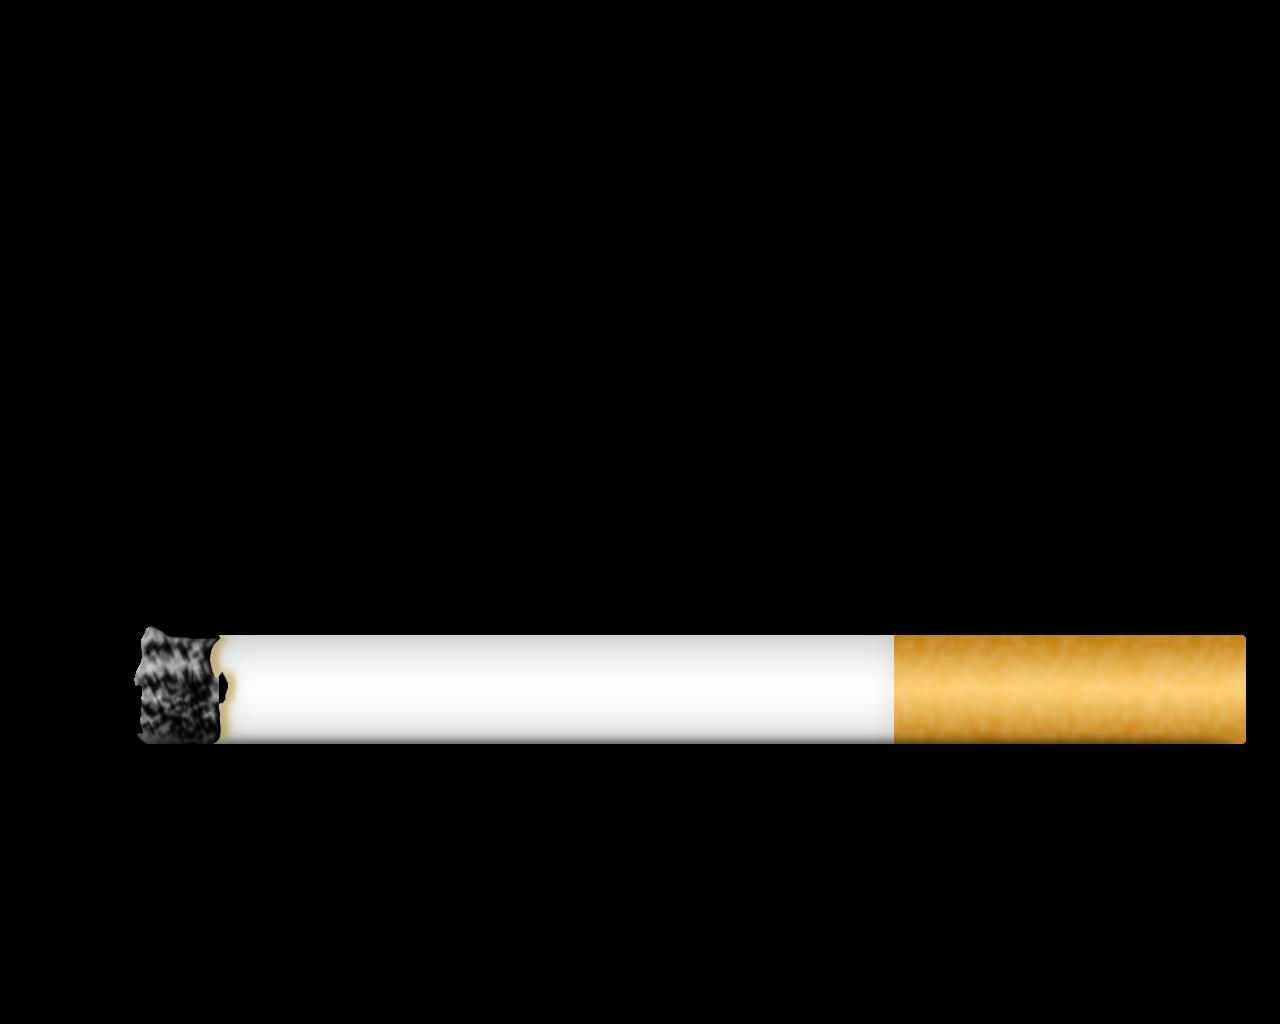 Cigarro png 1 » PNG Image.